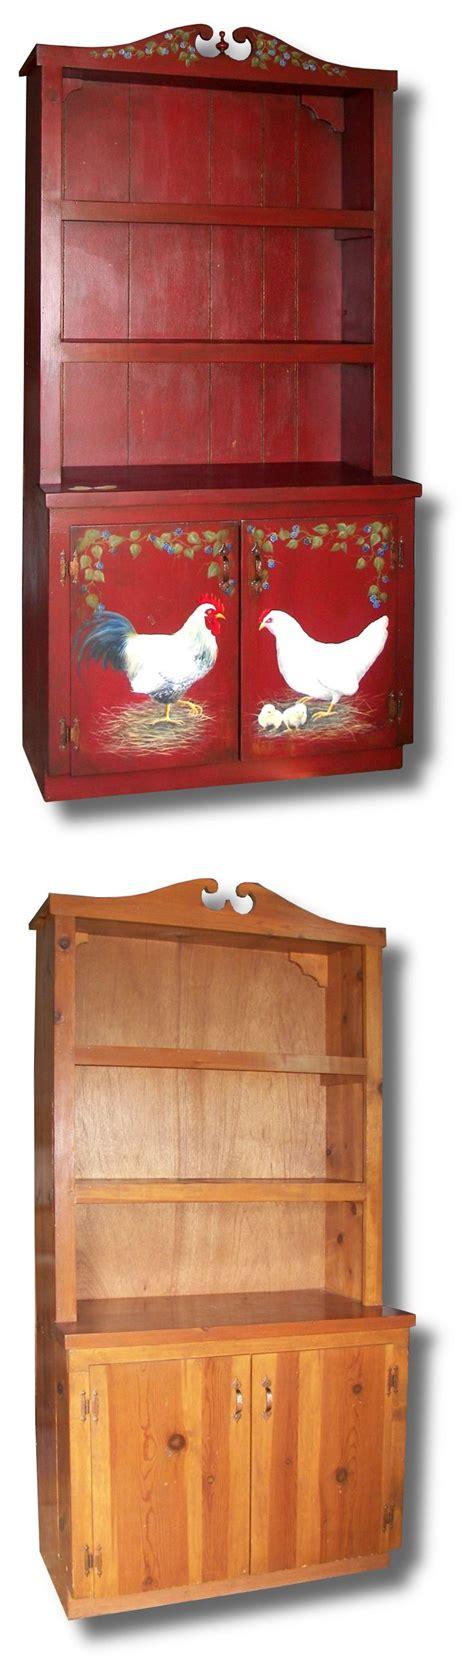 red kitchen pantry cabinet best 25 red background ideas on pinterest van gogh